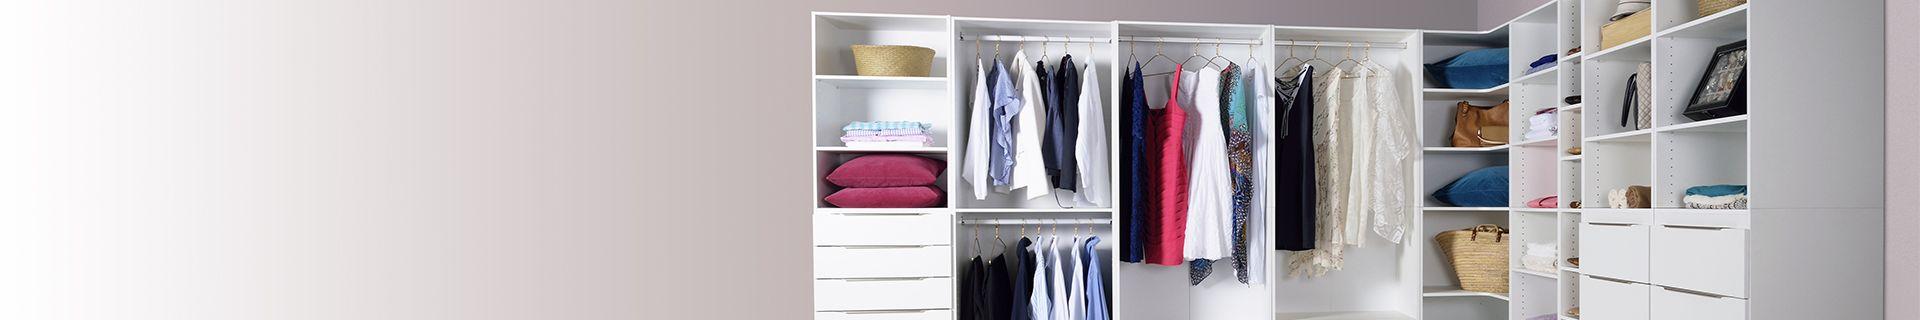 Wardrobe with clothing